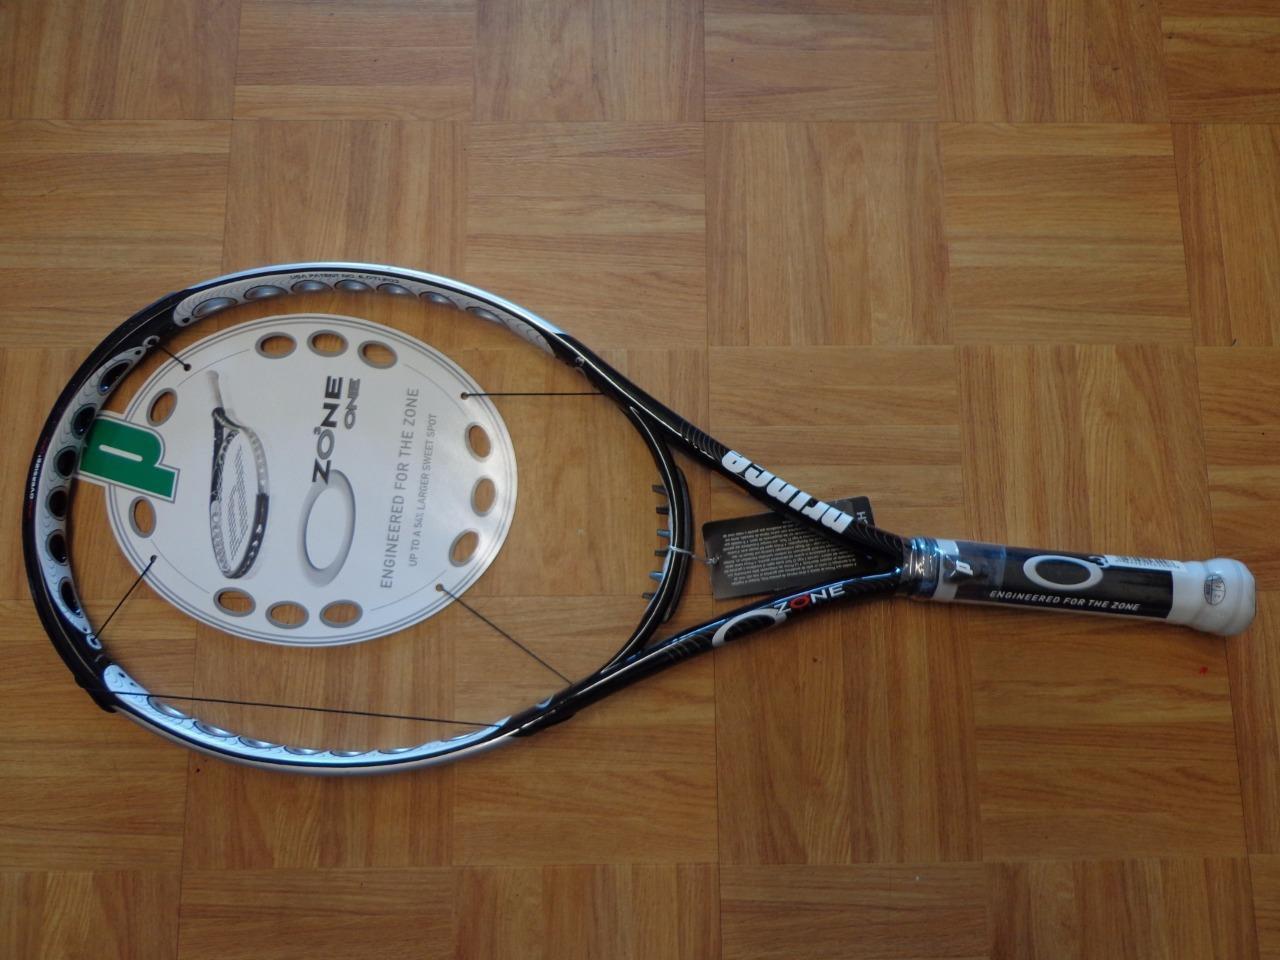 NEW PRINCE OZONE 1 118 head 4 1 2 grip Tennis Racquet